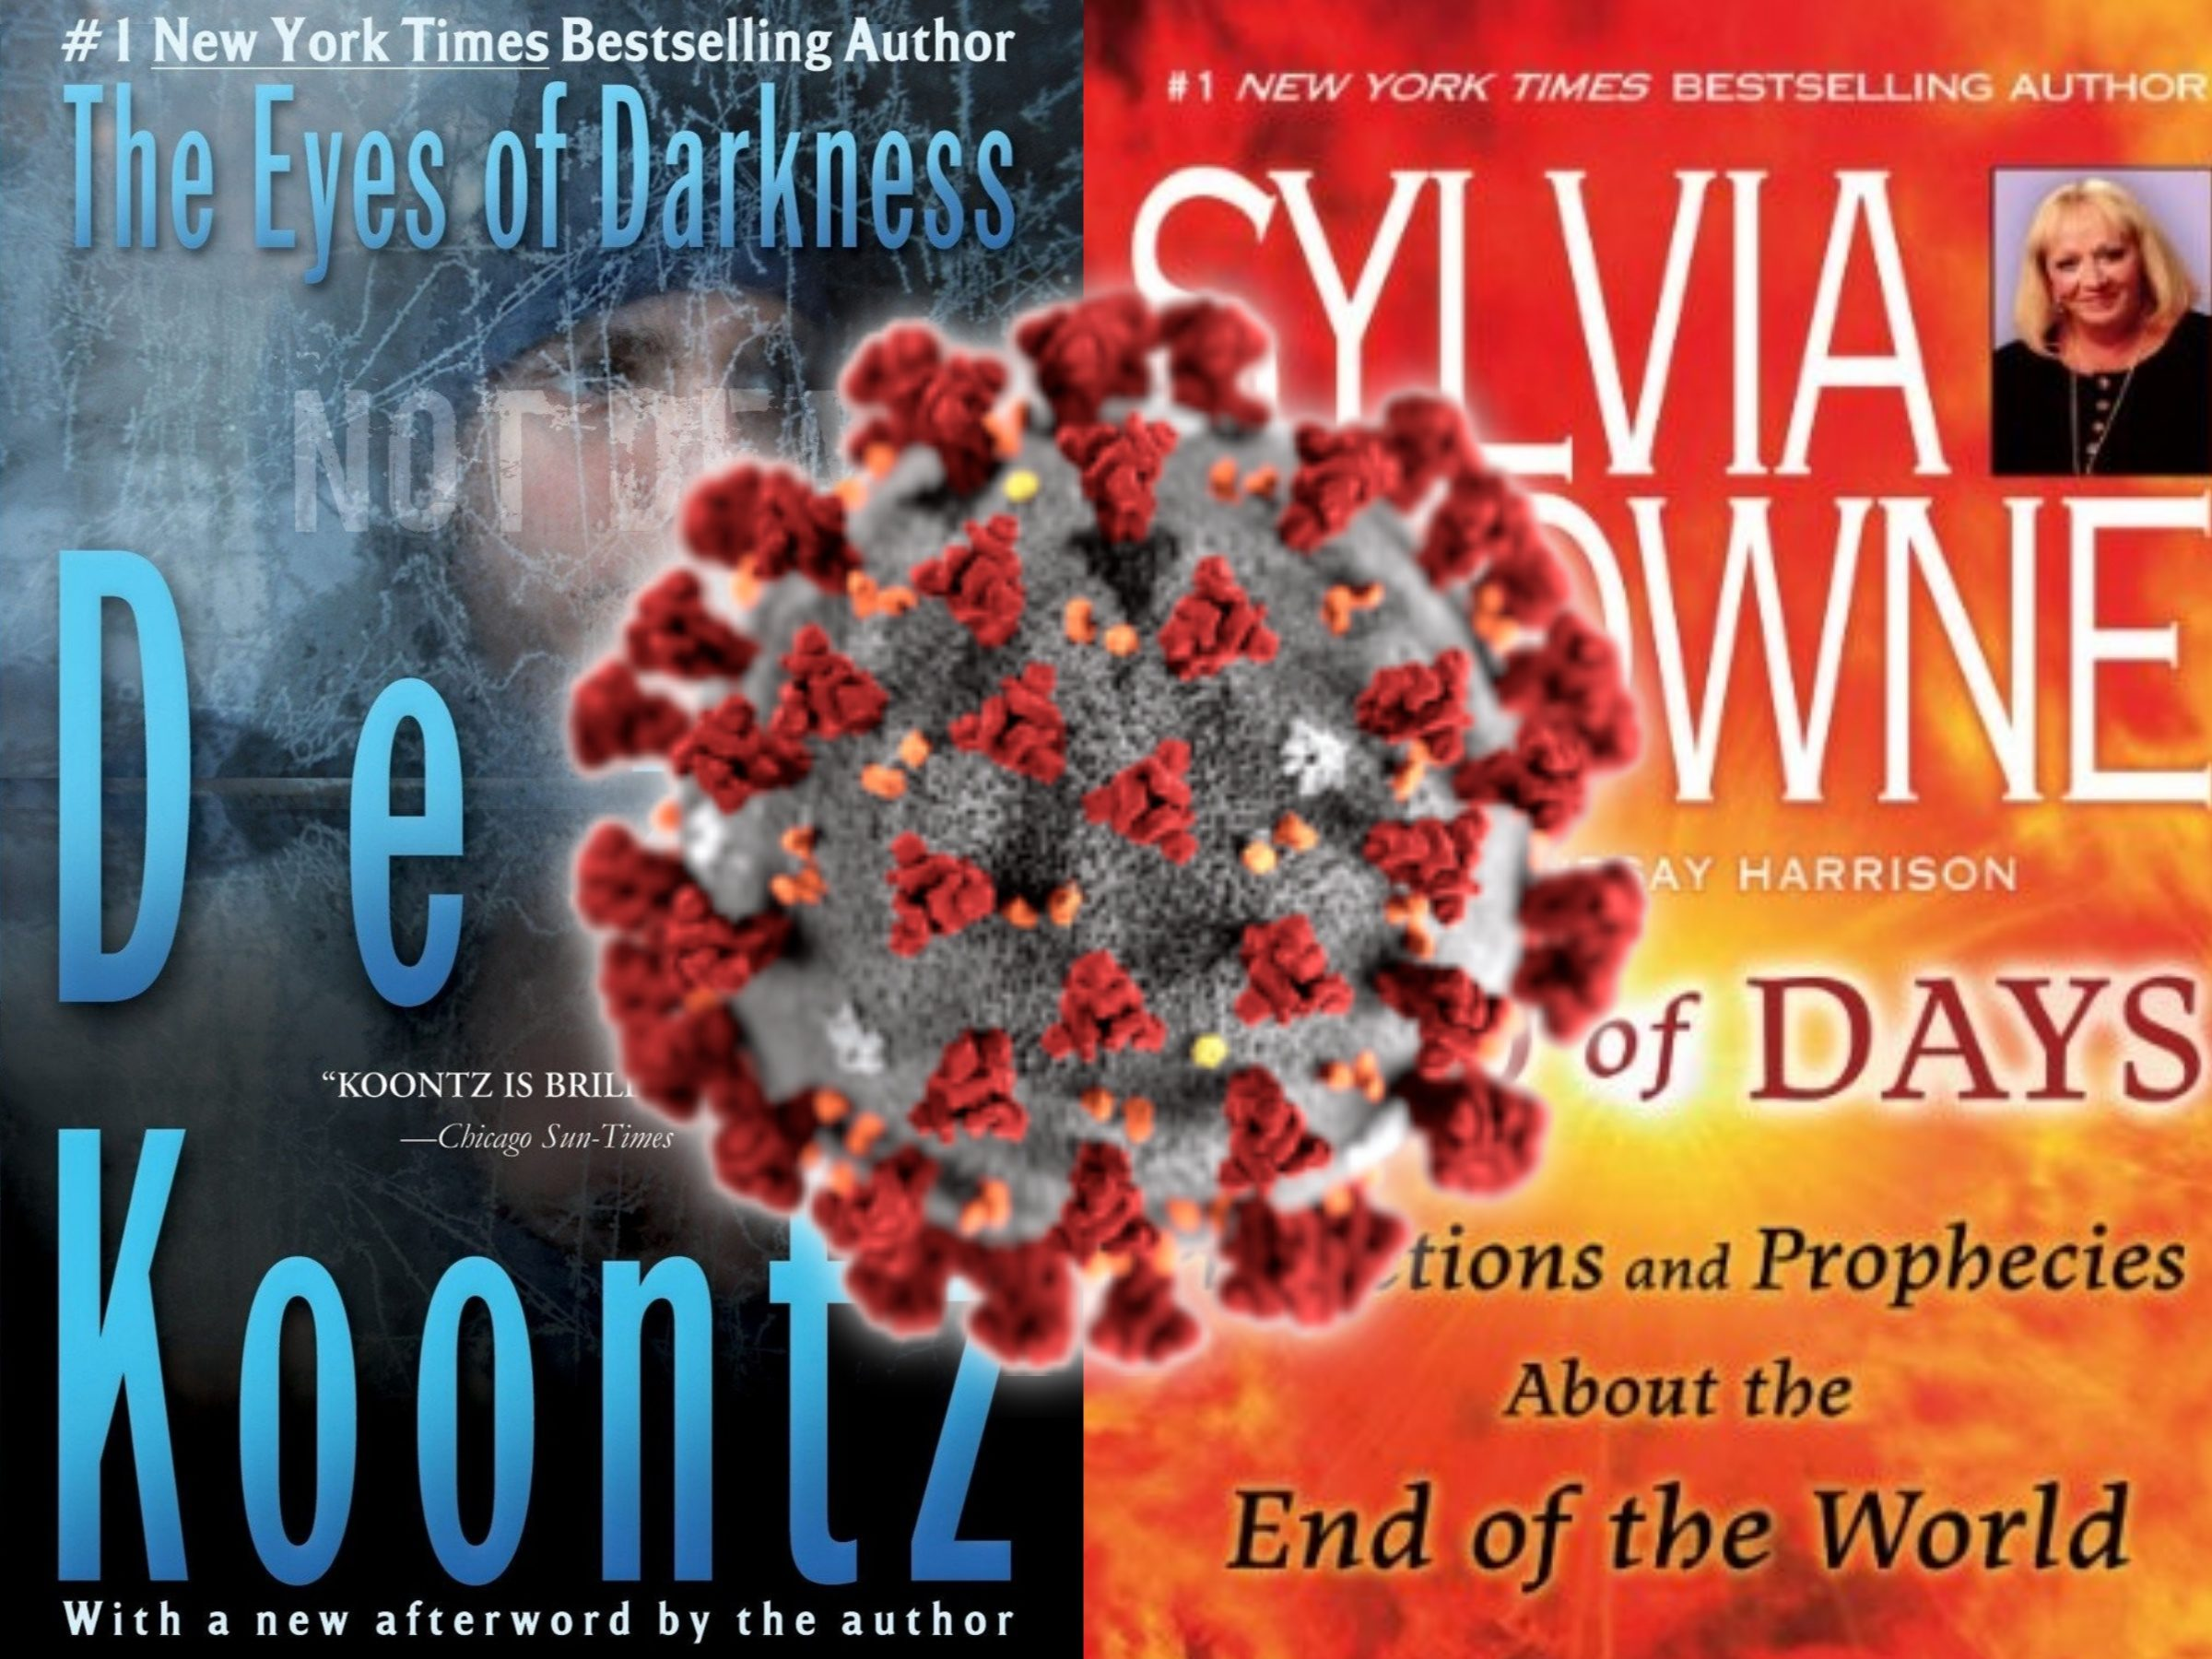 Did two books predict the corona virus?